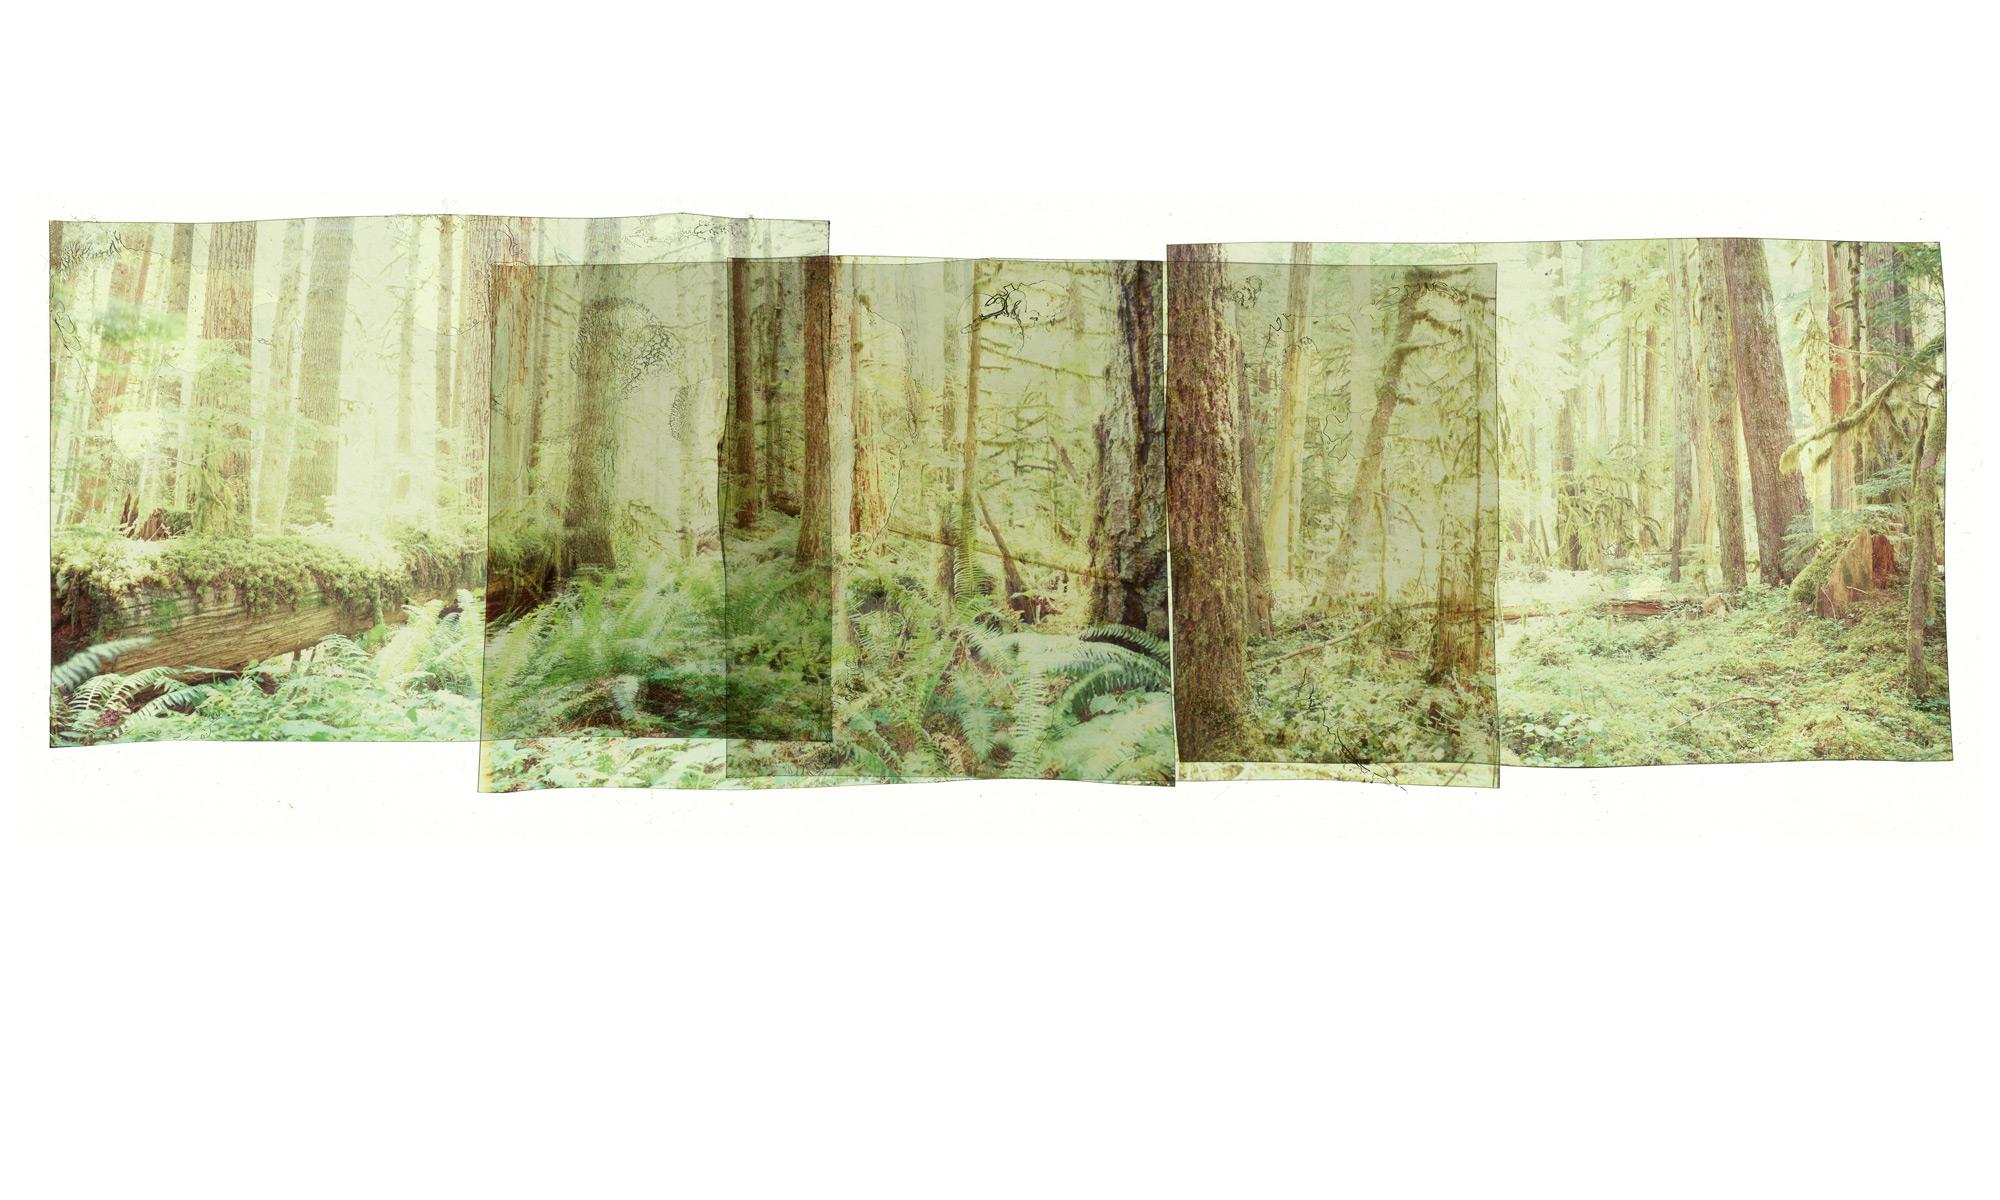 _0008_The-American-Rainforest.jpg